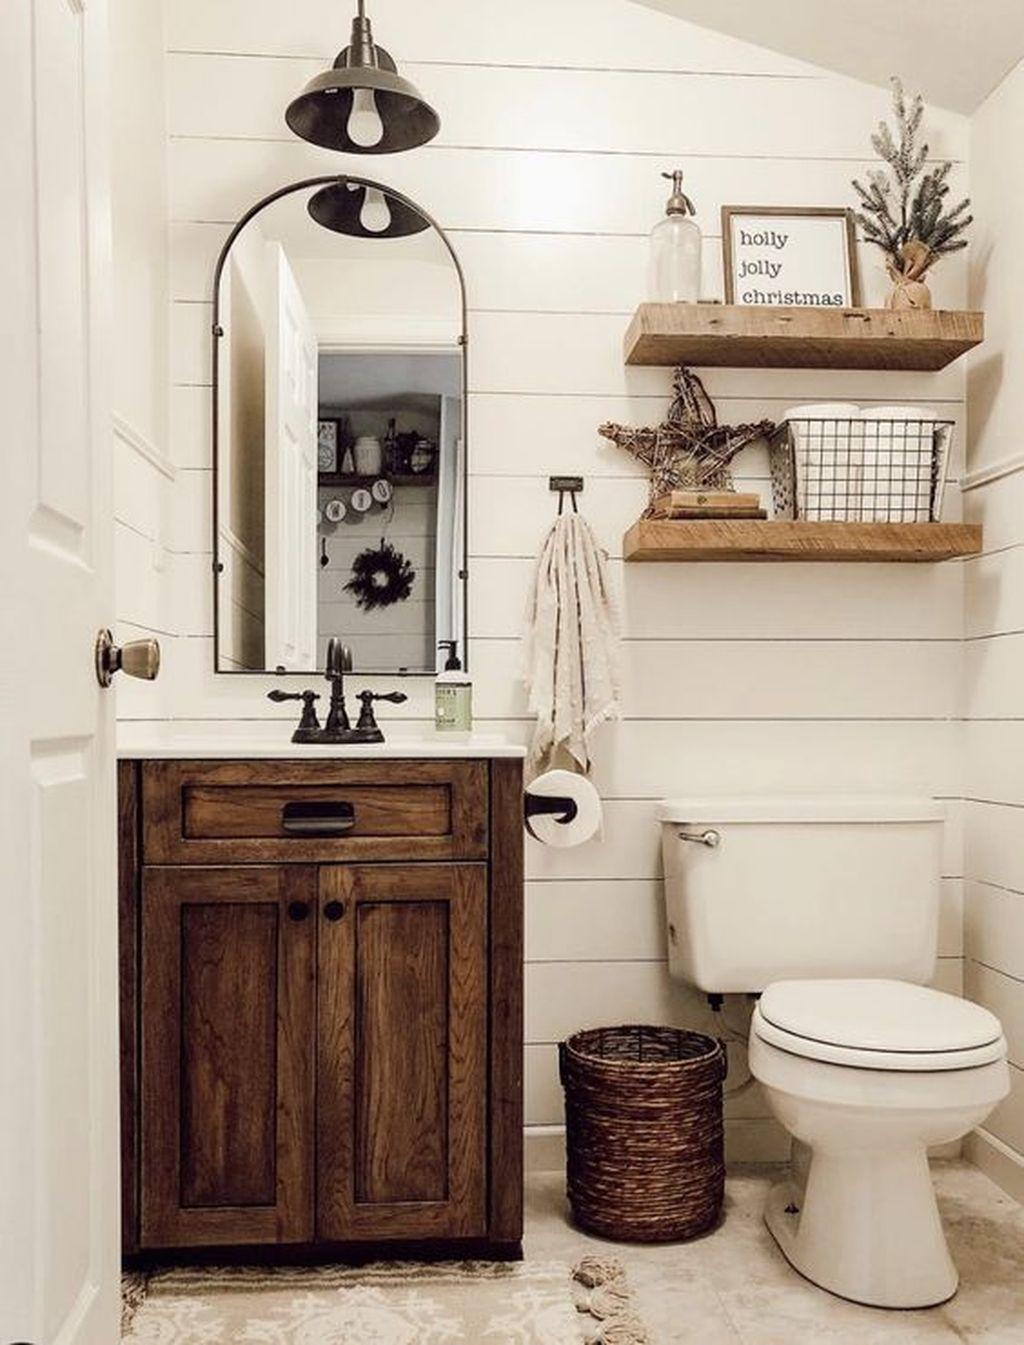 Fascinating Rustic Bathroom Decor Ideas You Must Copy 03